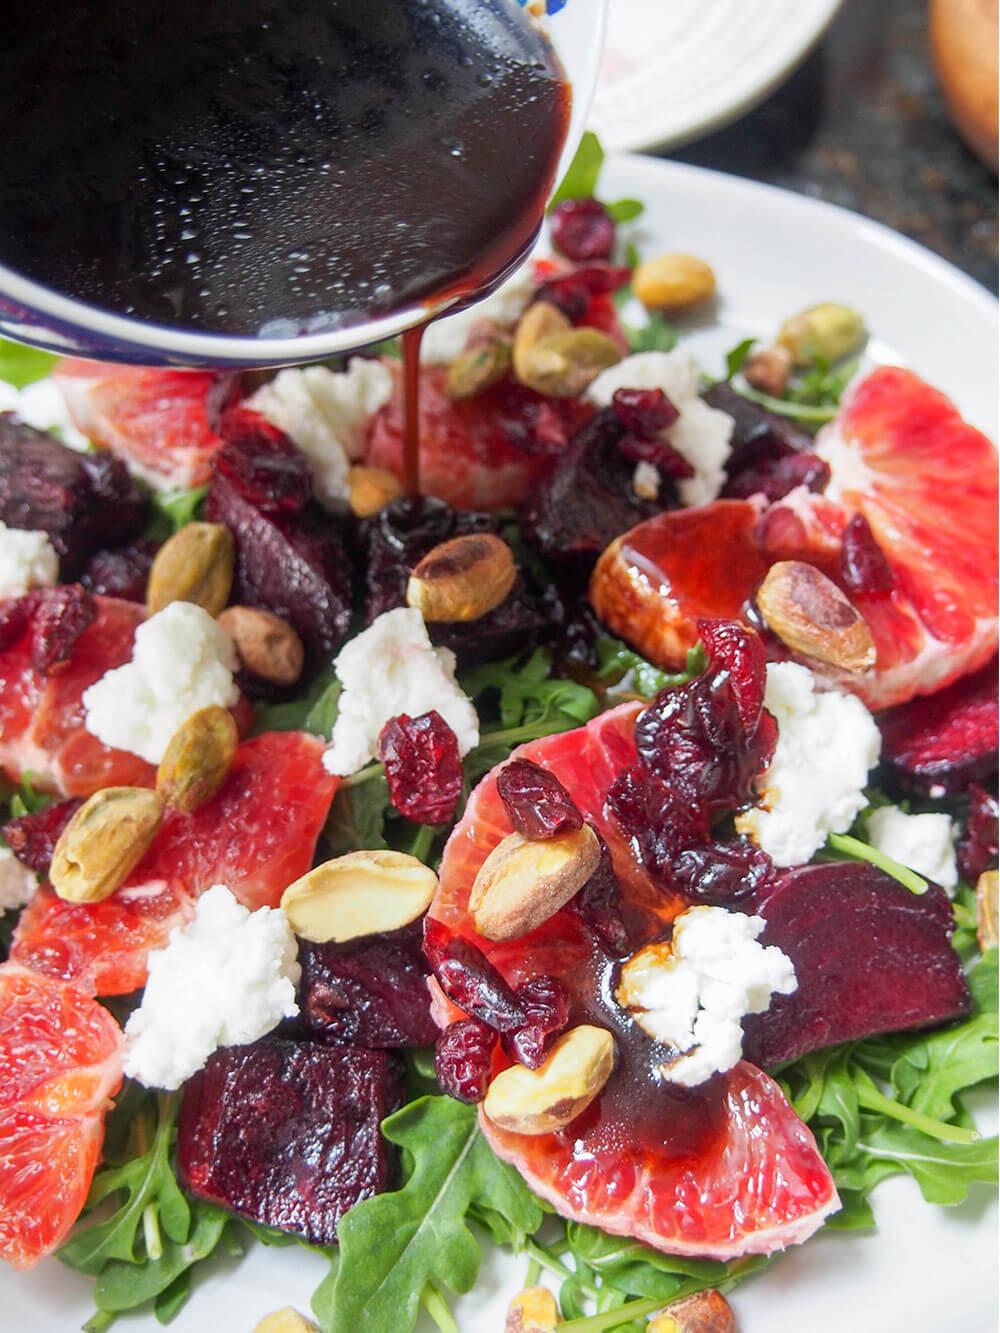 adding dressing to beet and blood orange salad